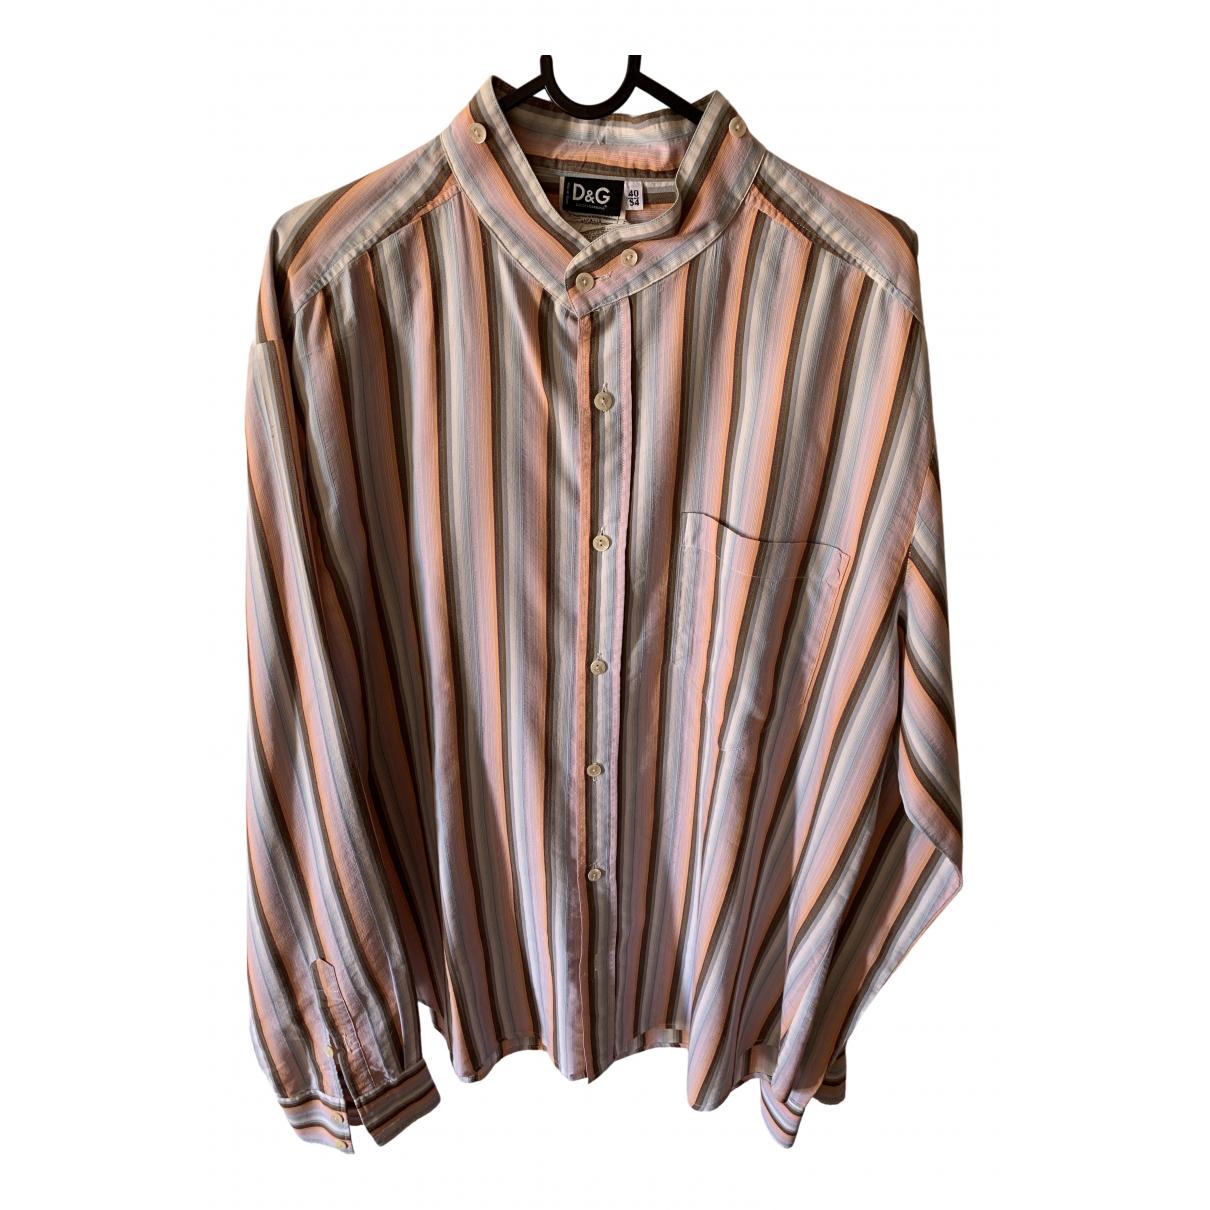 D&g \N Multicolour Cotton Shirts for Men 40 EU (tour de cou / collar)